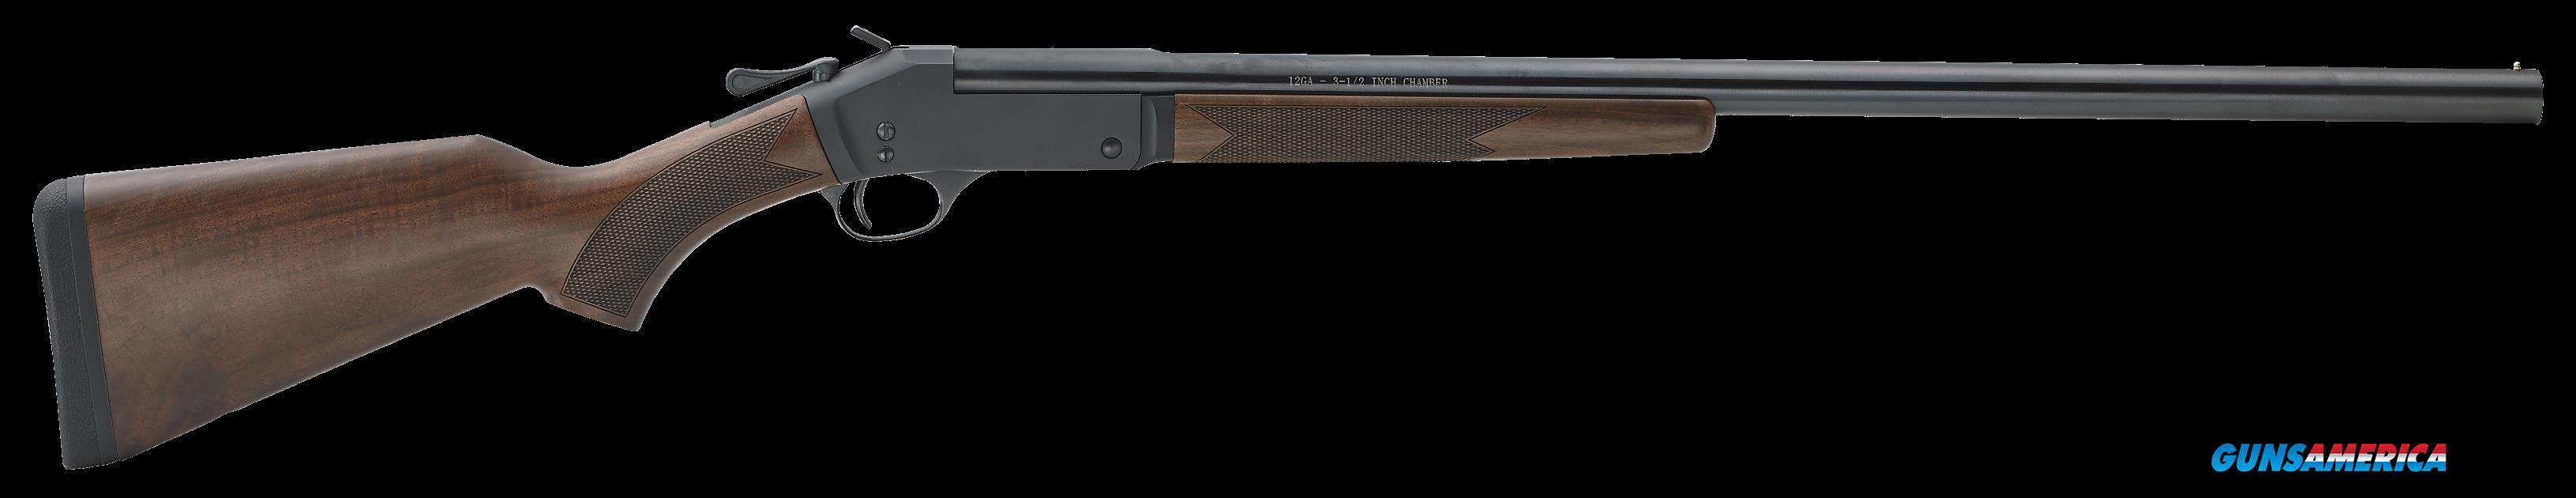 Henry Single Shot, Henry H01512    Single Shot 12ga Steel  Guns > Pistols > 1911 Pistol Copies (non-Colt)